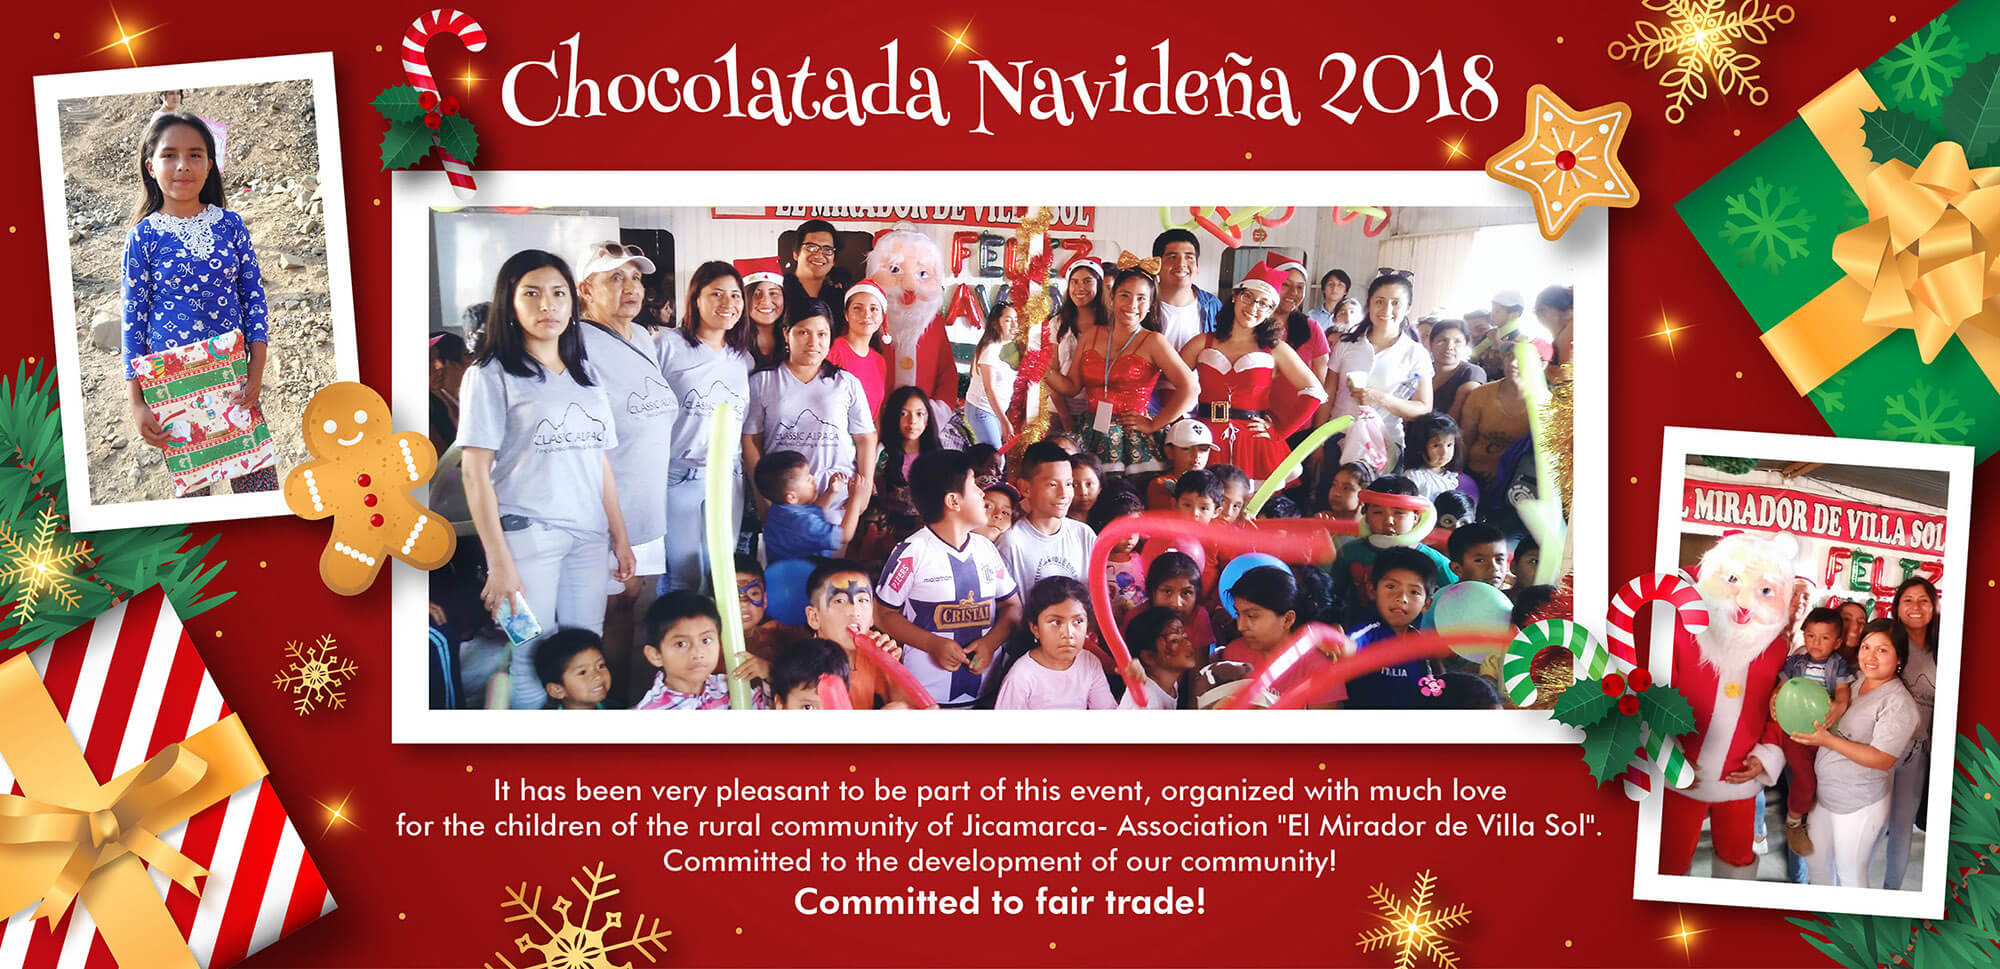 Christmas Chocolate - Classic Alpaca Peru